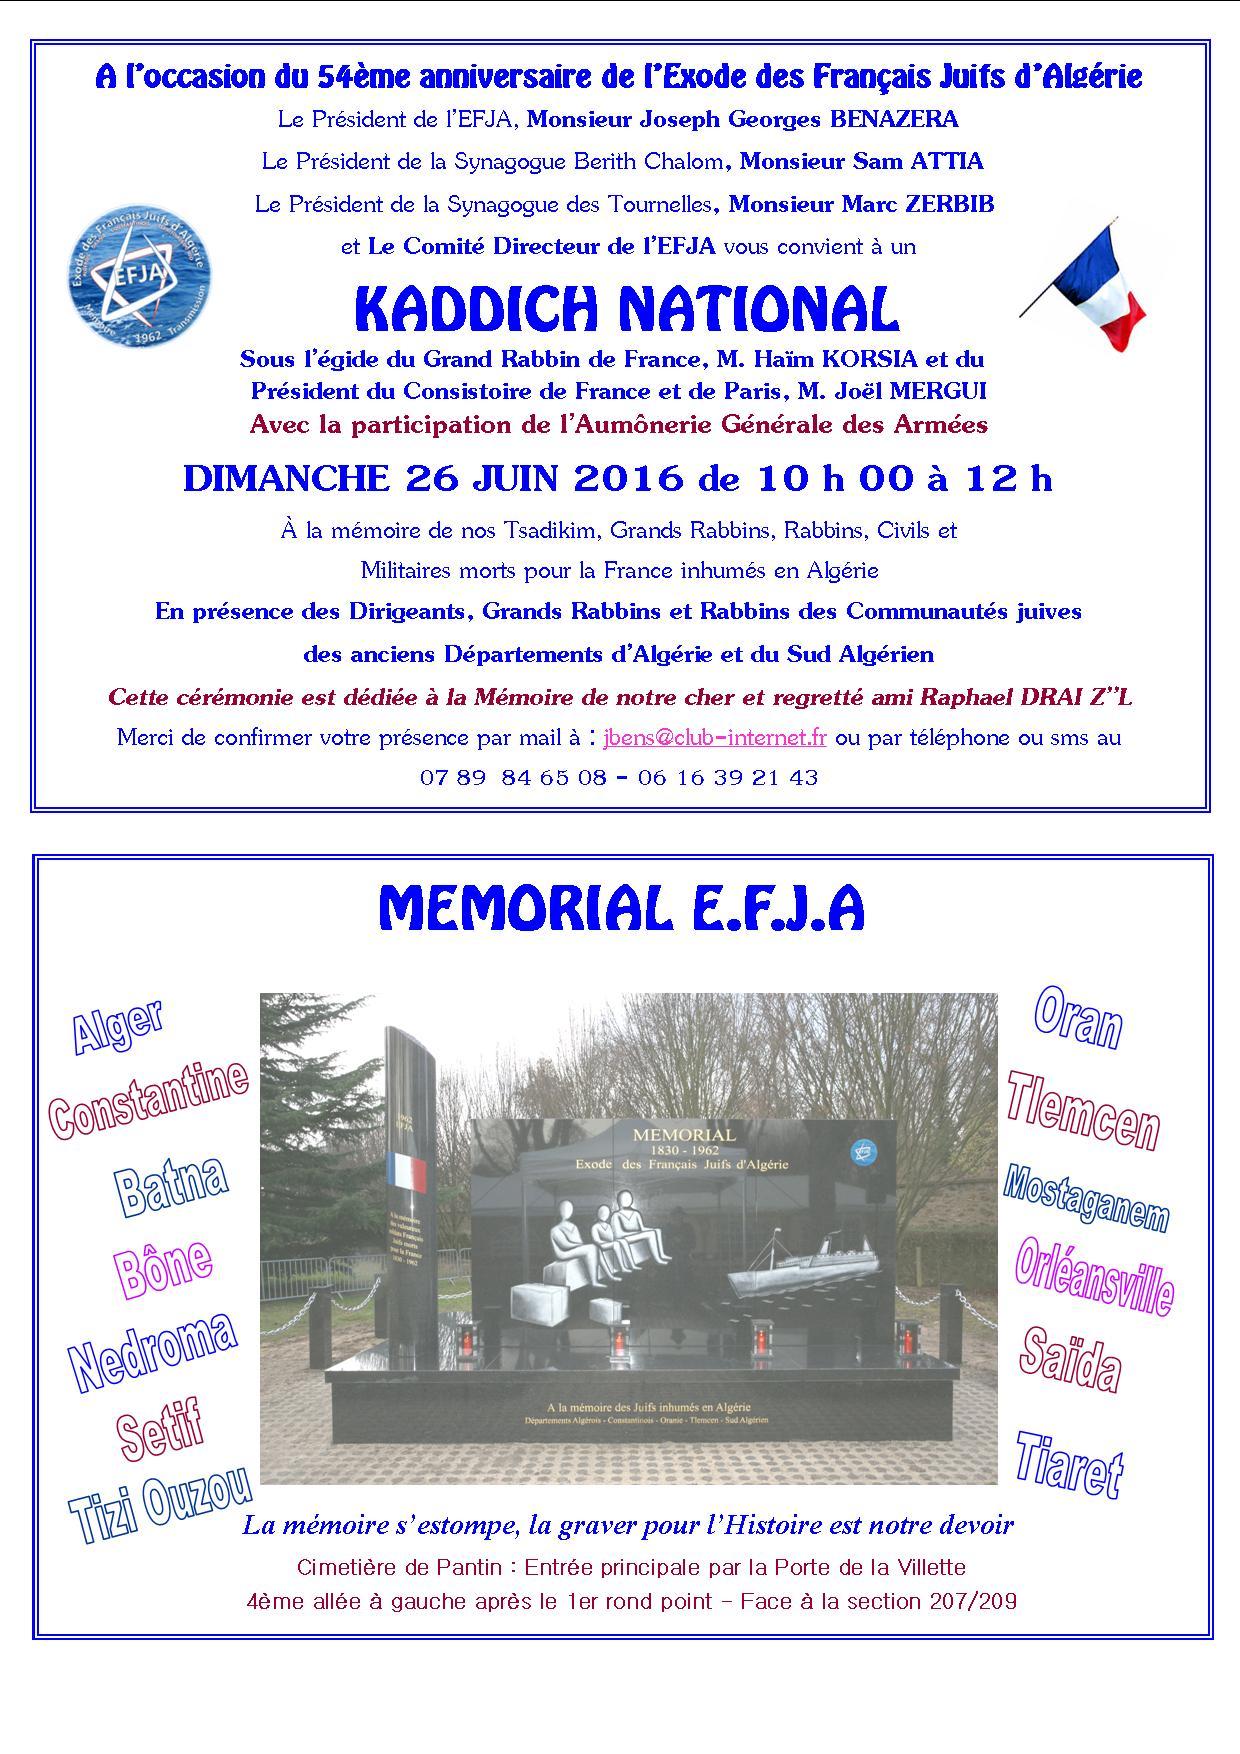 carton Kaddish National du 26 juin 2016 pour site